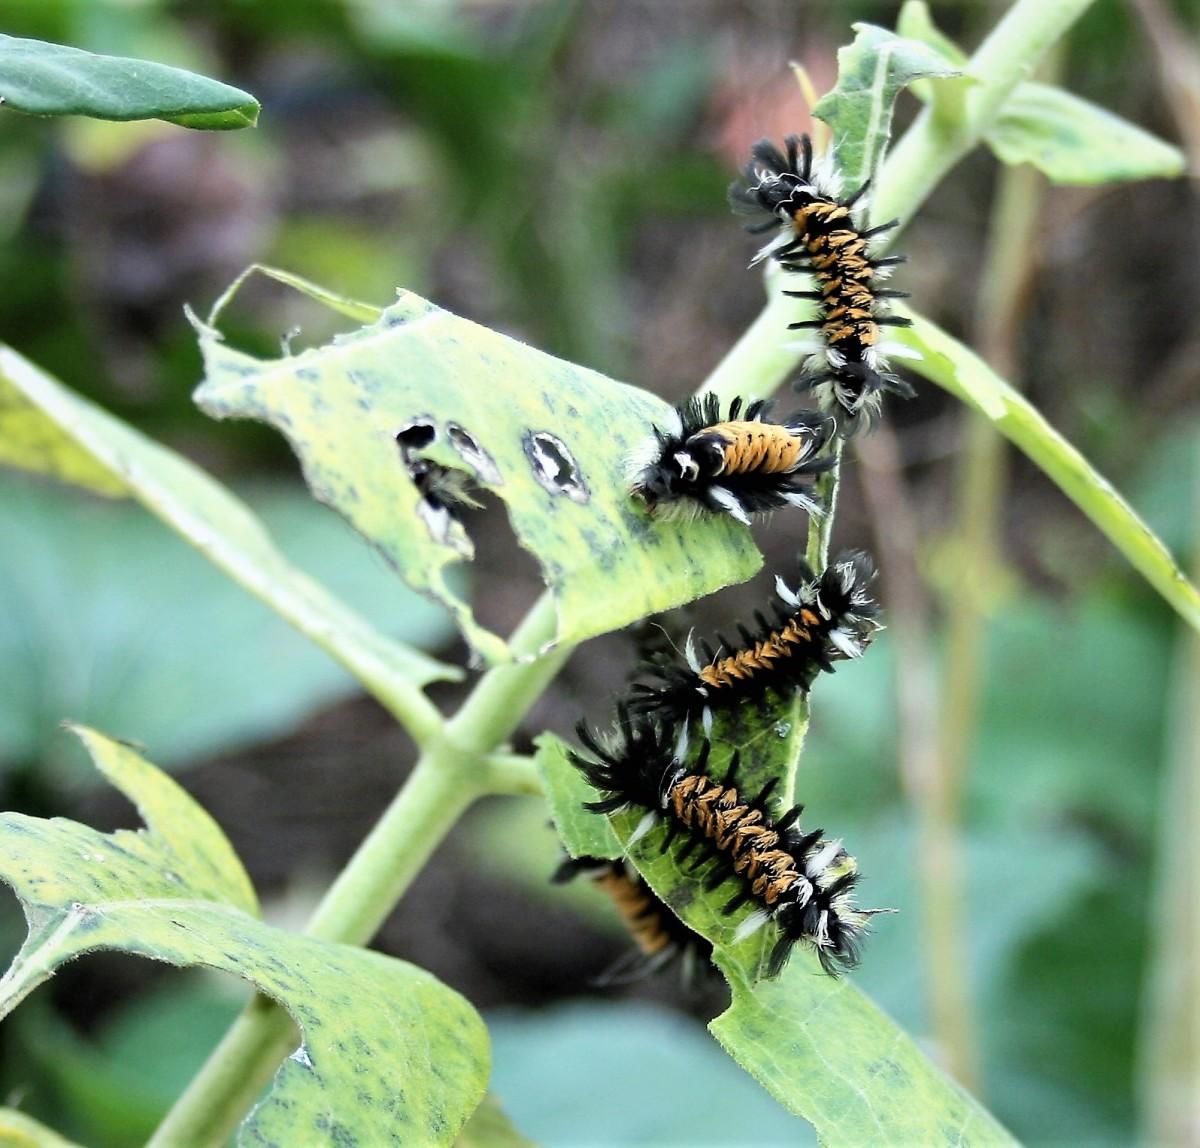 Milkweed is the host plant for the Milkweed Tussock Moth.